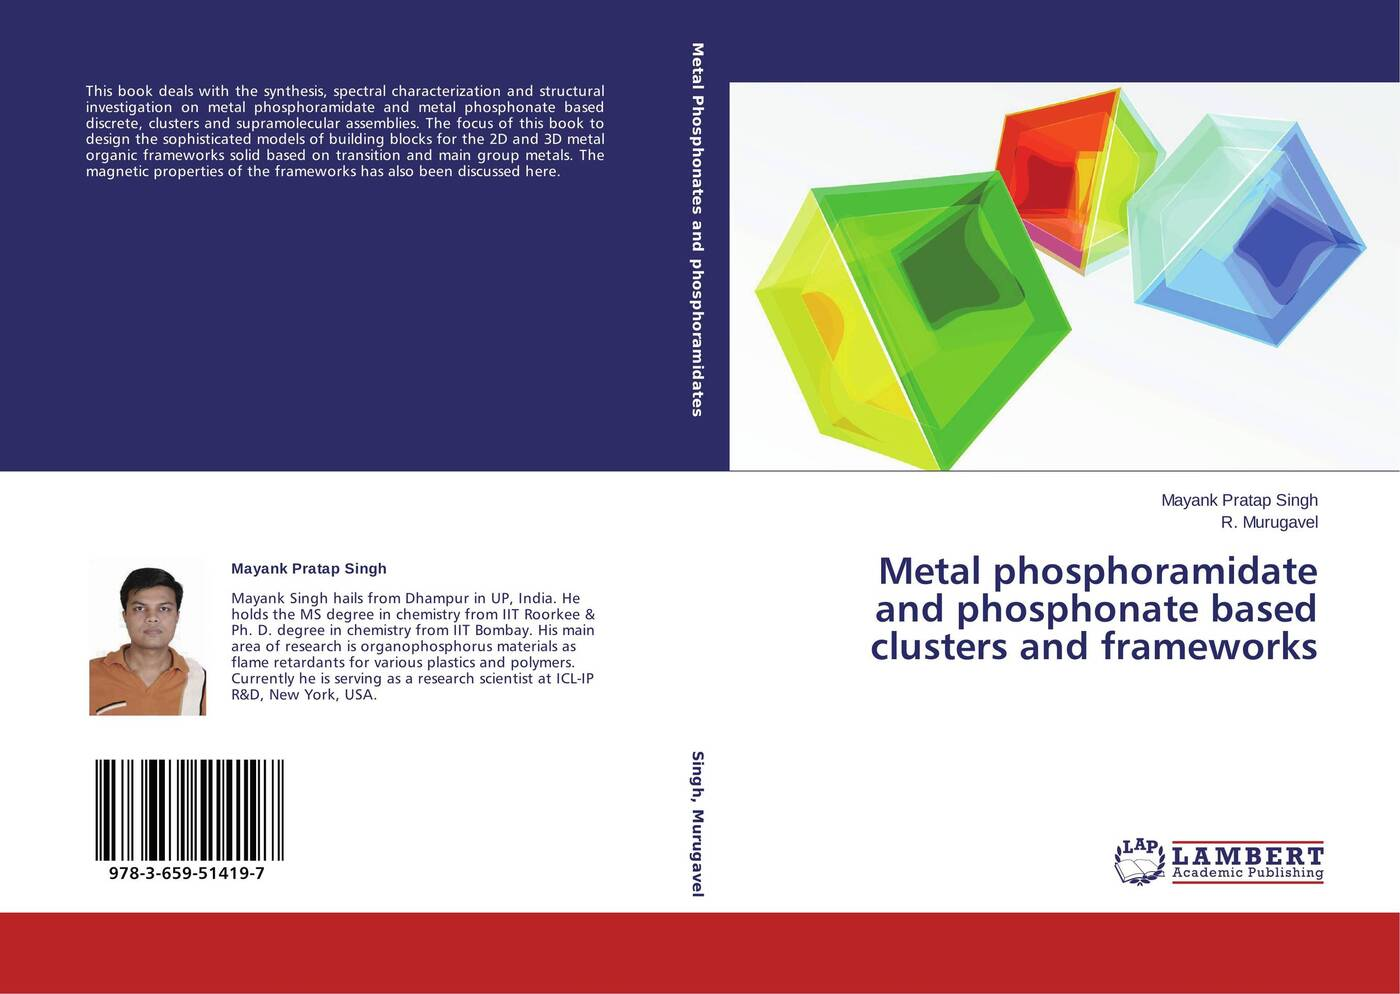 Mayank Pratap Singh and R. Murugavel Metal phosphoramidate and phosphonate based clusters and frameworks dabhi harishkumar r rana arjunsinh k parmar ketankumar h studies on metal chelates of pyrazolin based schiff bases